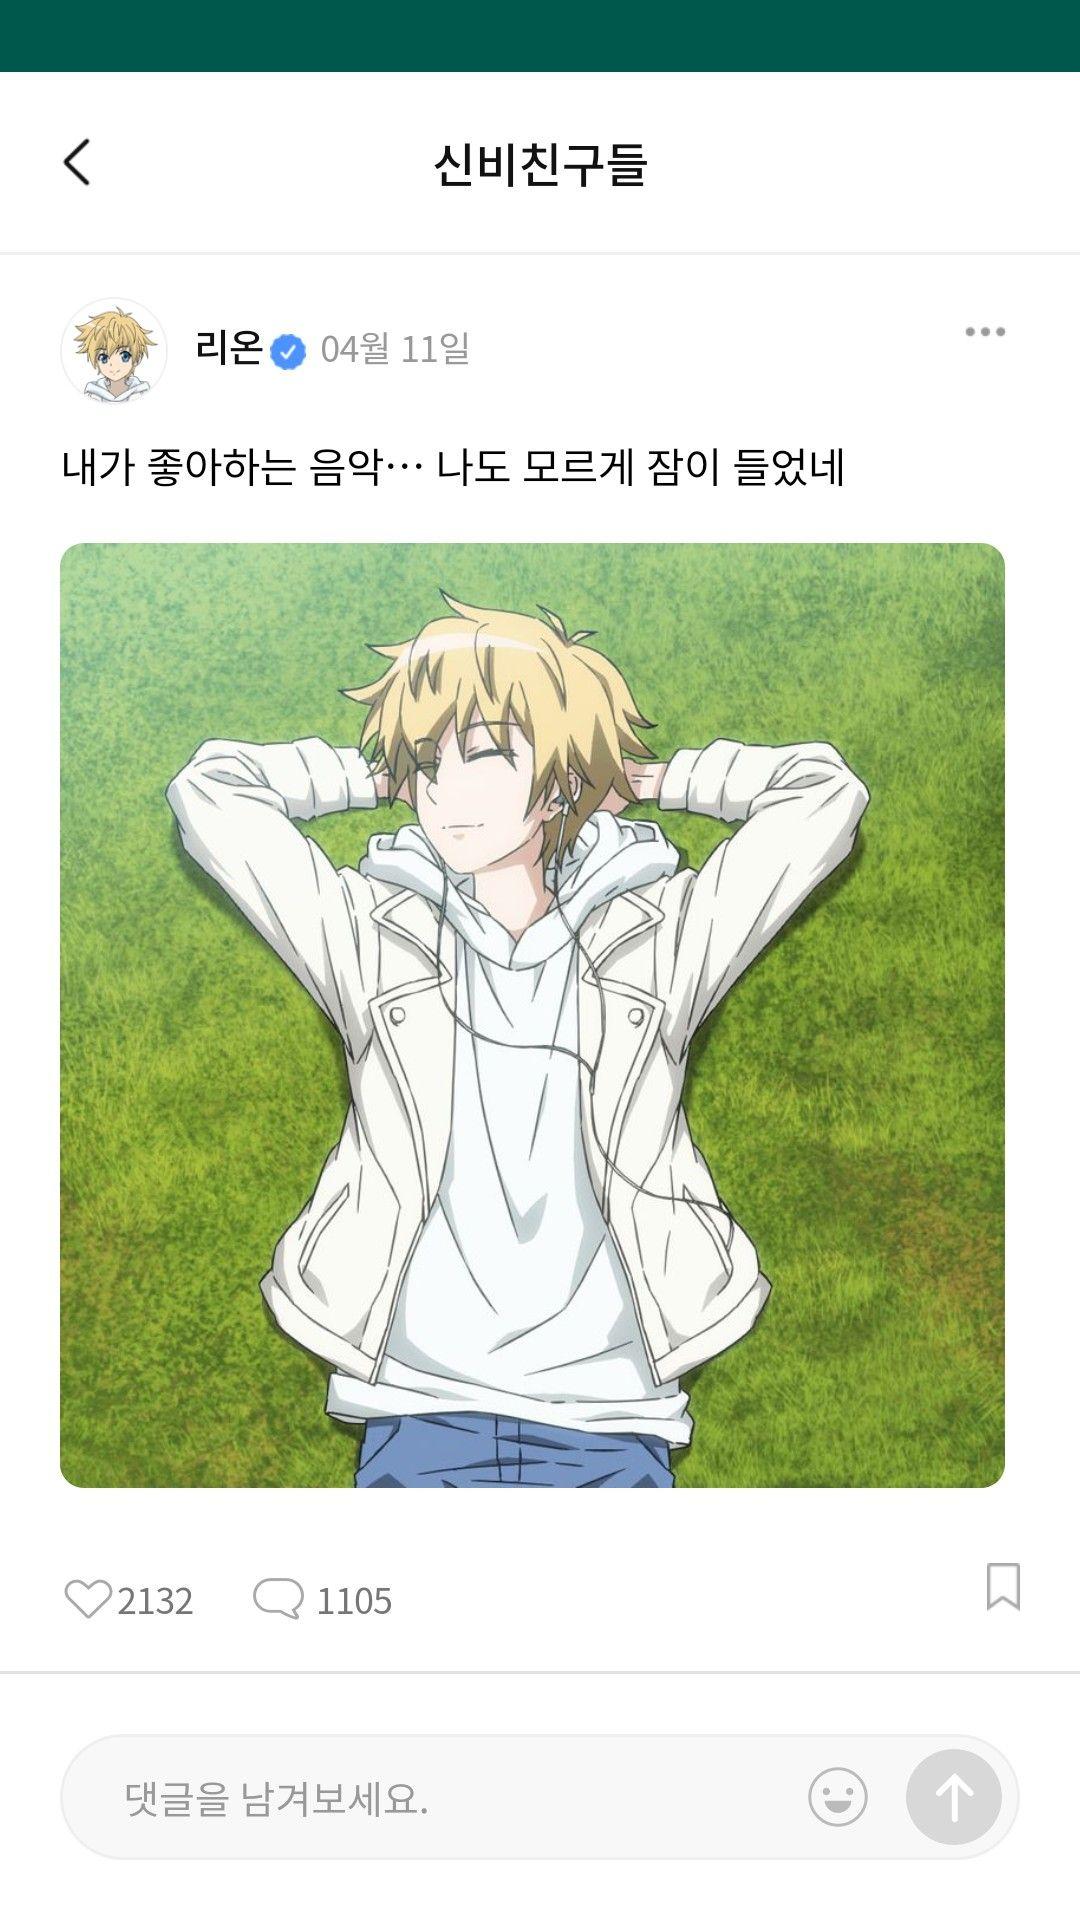 Pin oleh 💖강림♡하리💖 di anime | Gambar anime, Kartun, Seni gelap